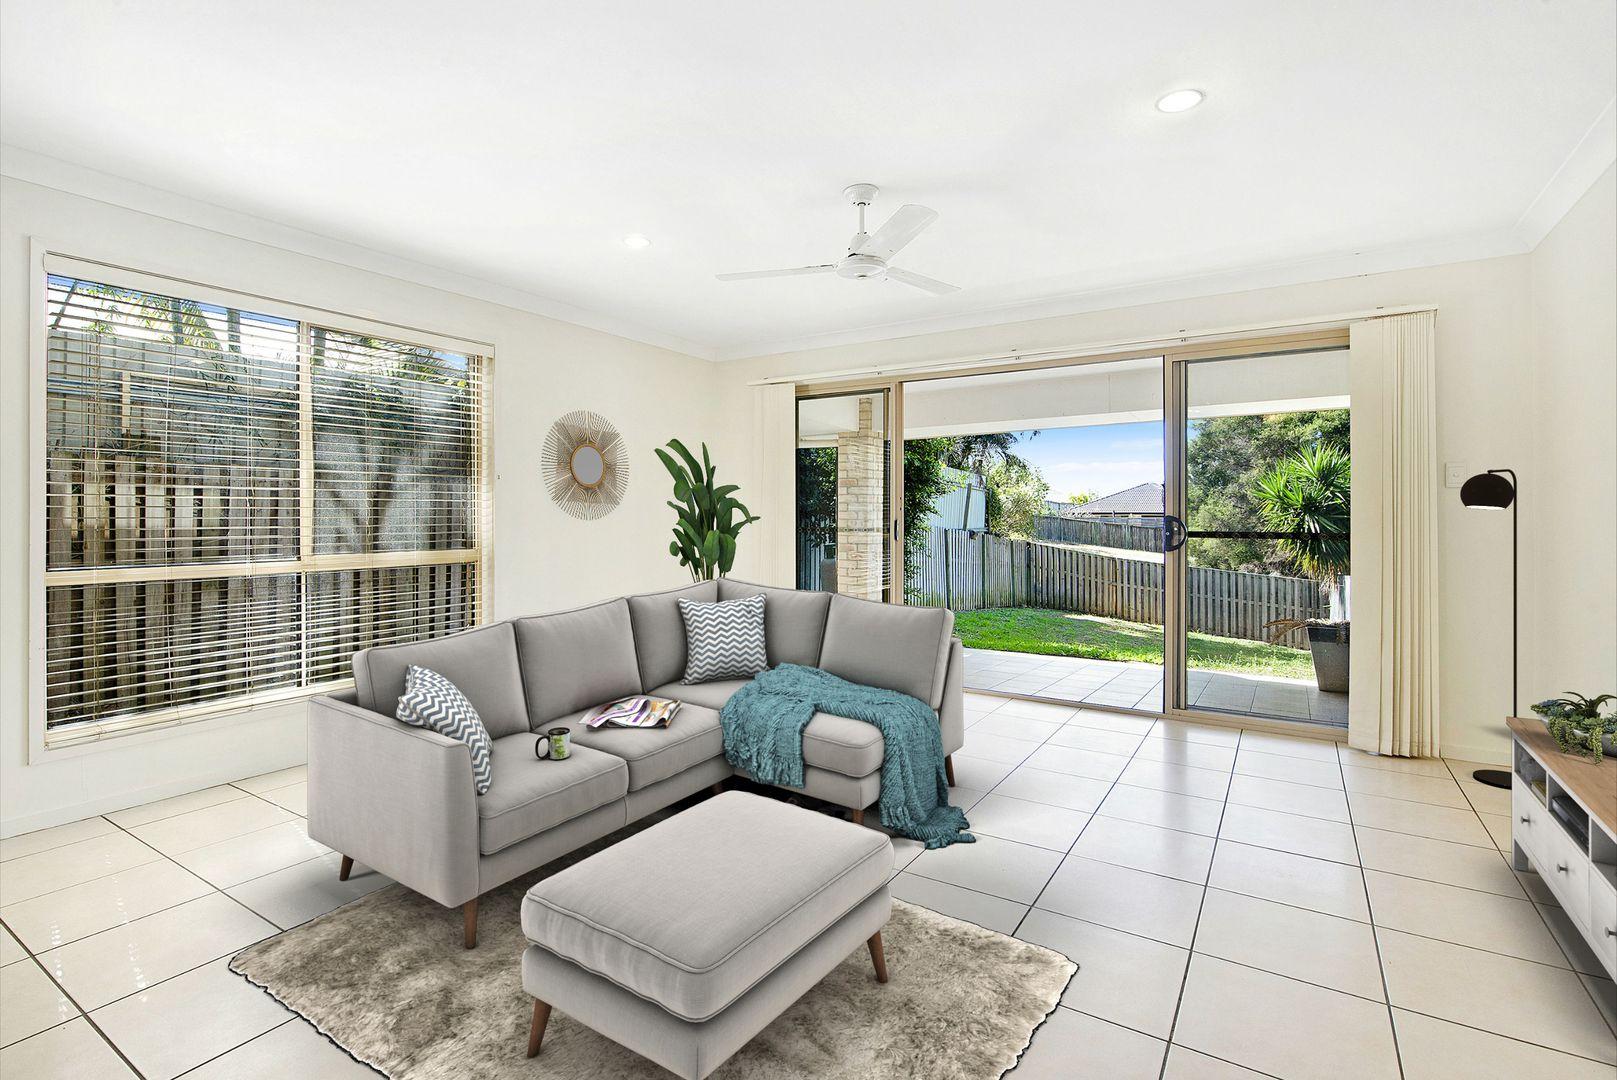 1/12 Pecan Drive, Upper Coomera QLD 4209, Image 2